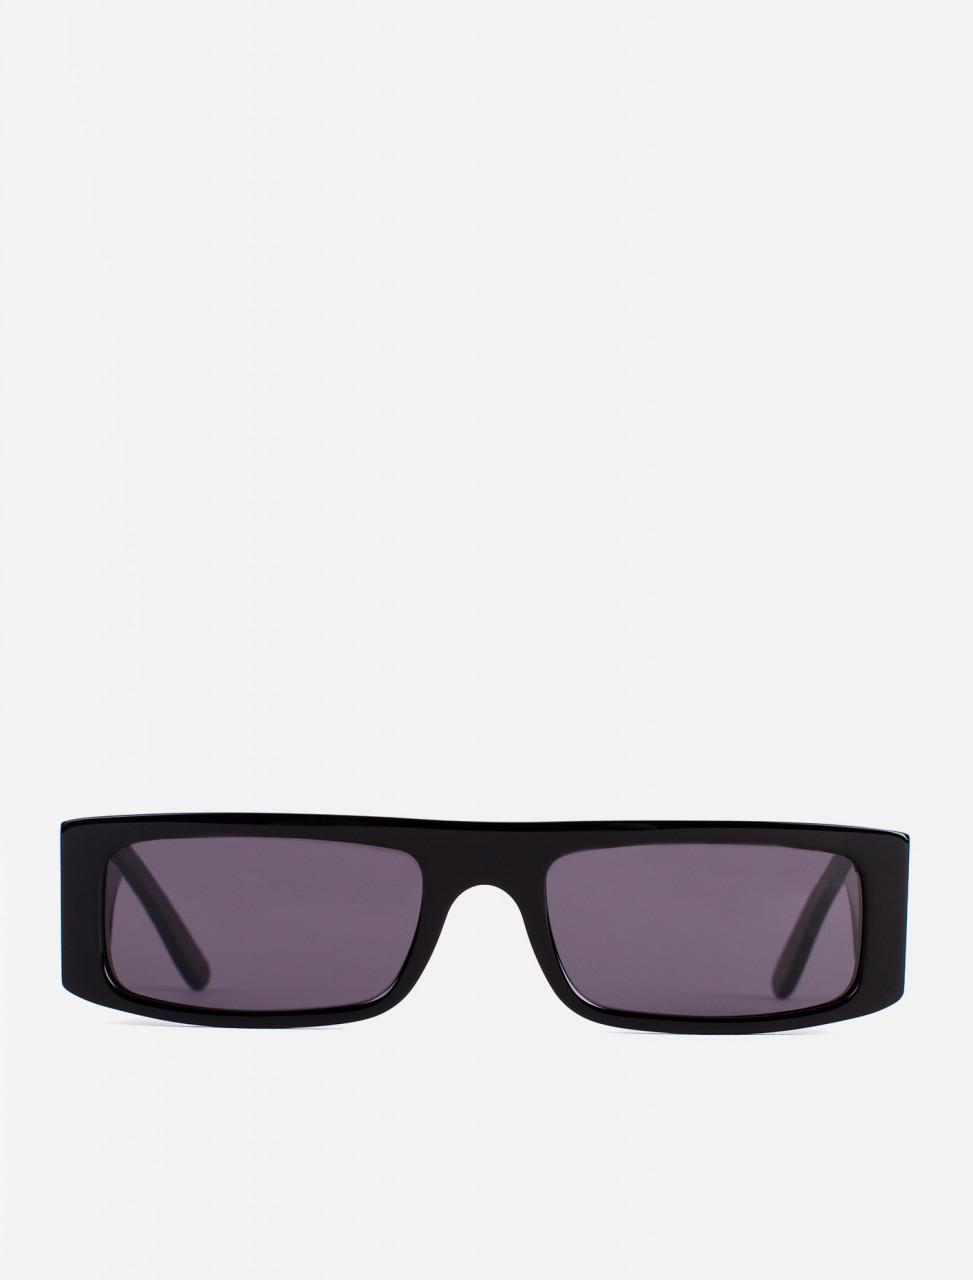 Hume Sunglasses